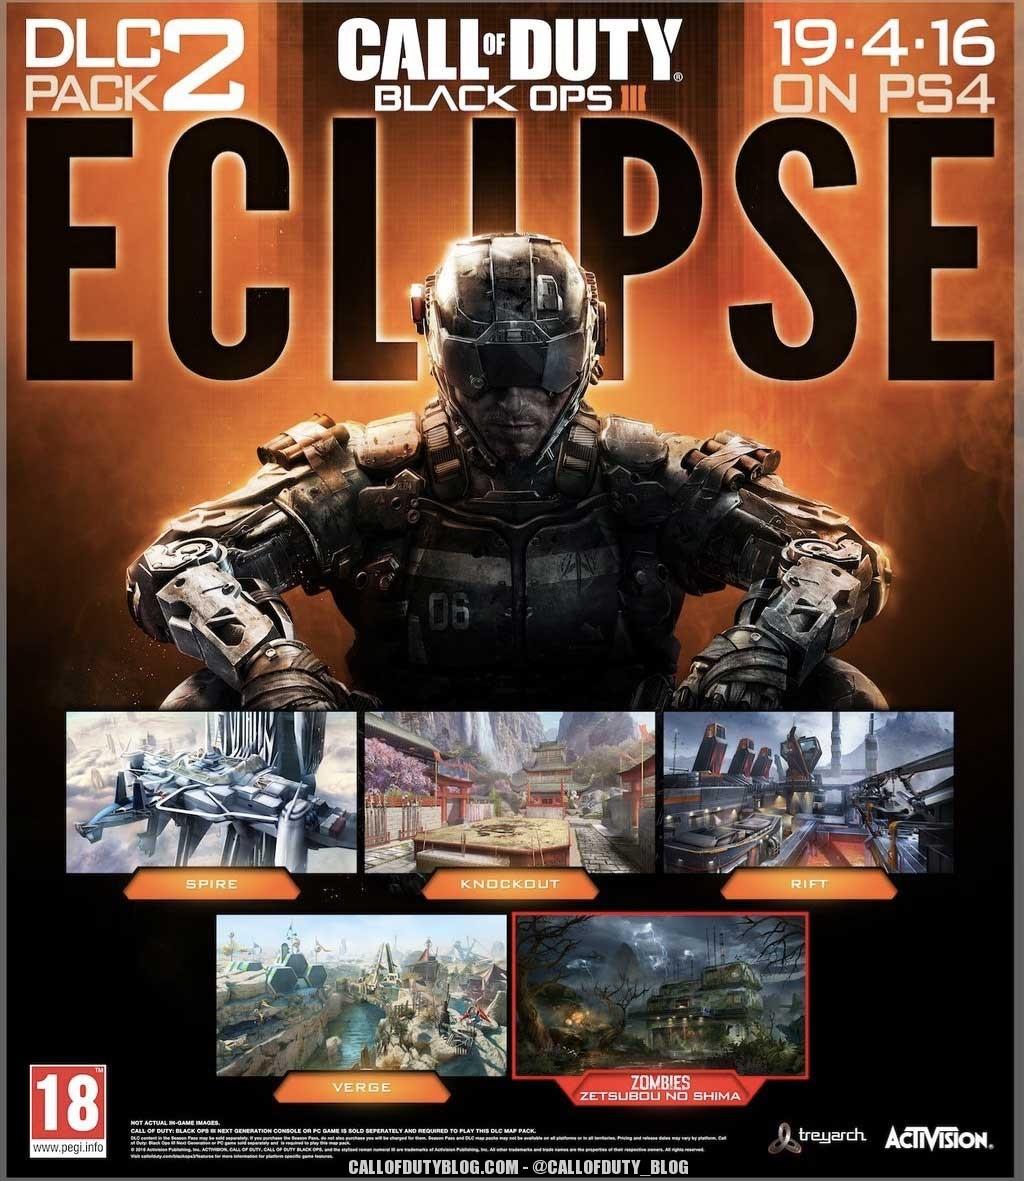 eclipse-dlc-poster